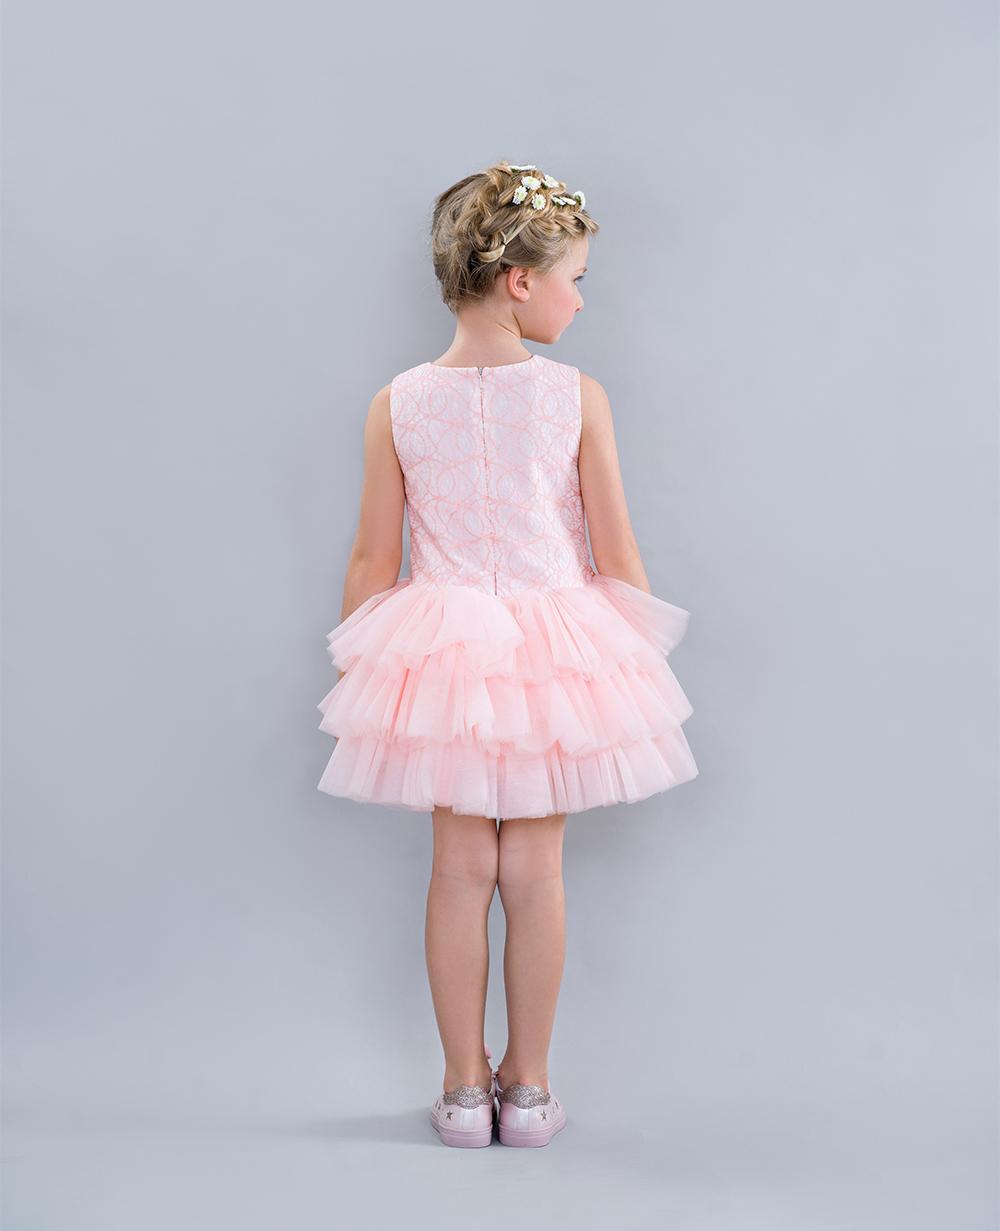 Pink Sleeveless Wedding Gown Formal Dress